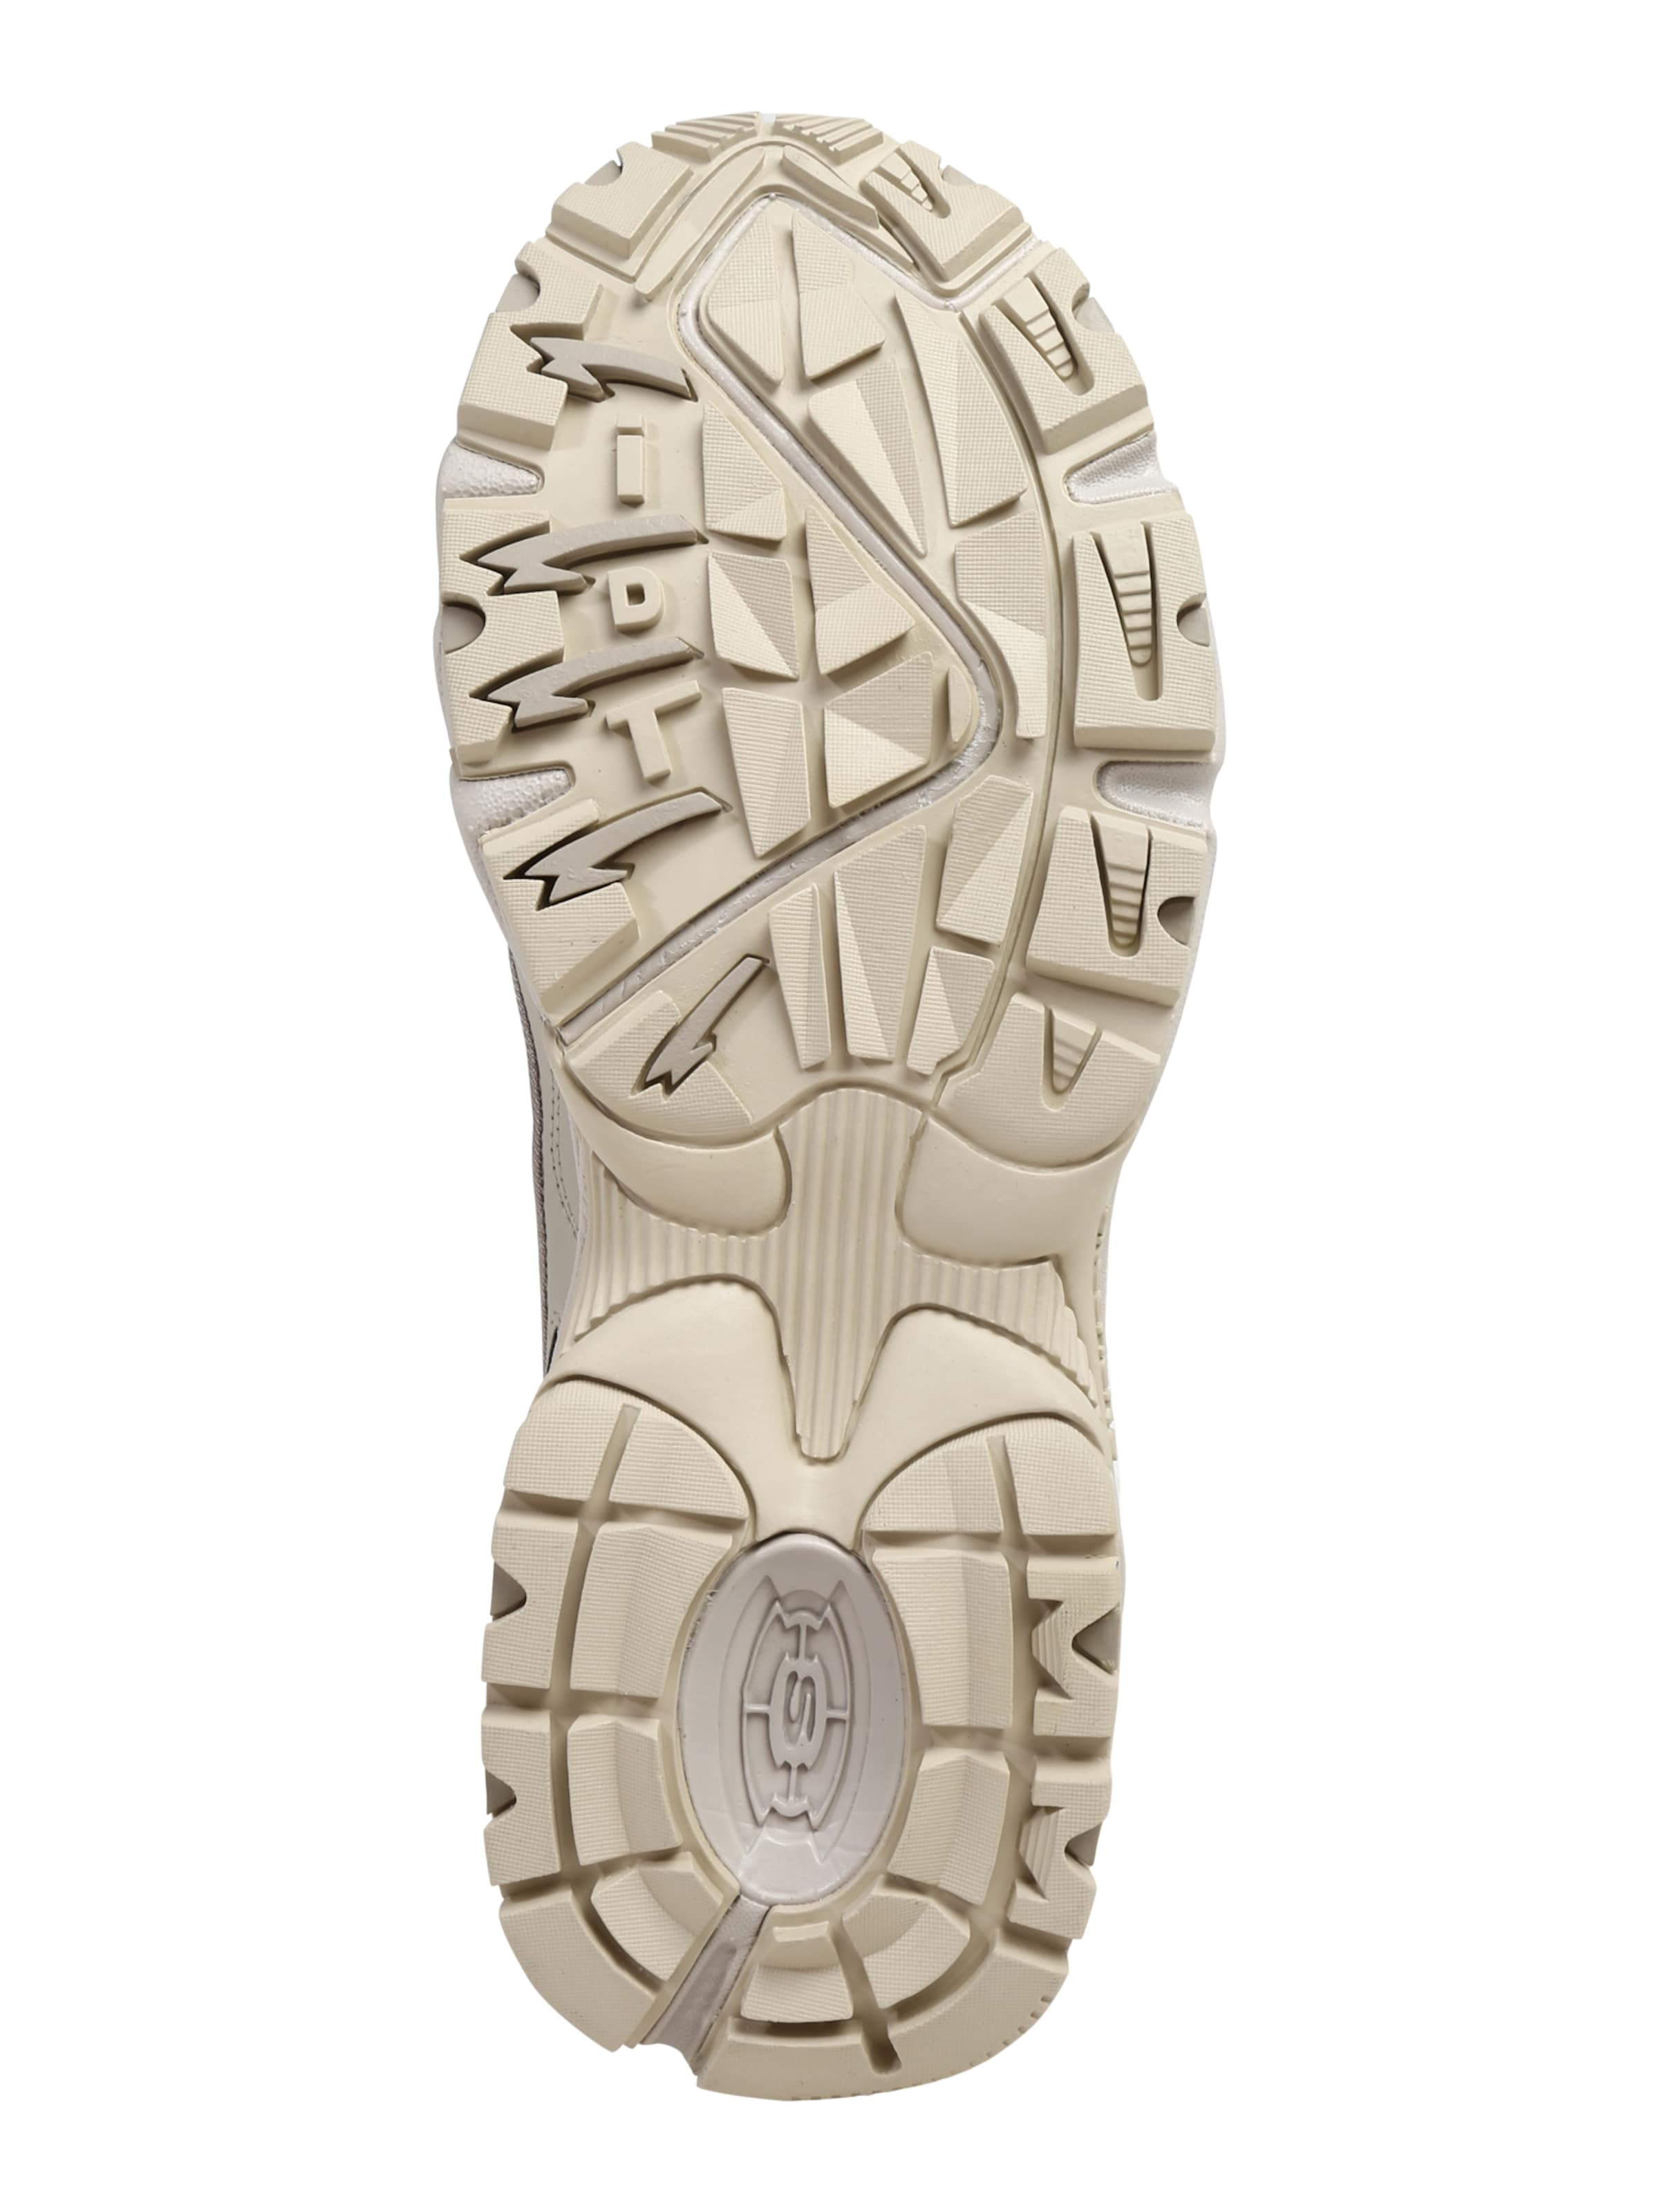 Sneaker 'staminaContic' In Skechers Sneaker 'staminaContic' In BeigeOffwhite Skechers N8Pymnv0wO